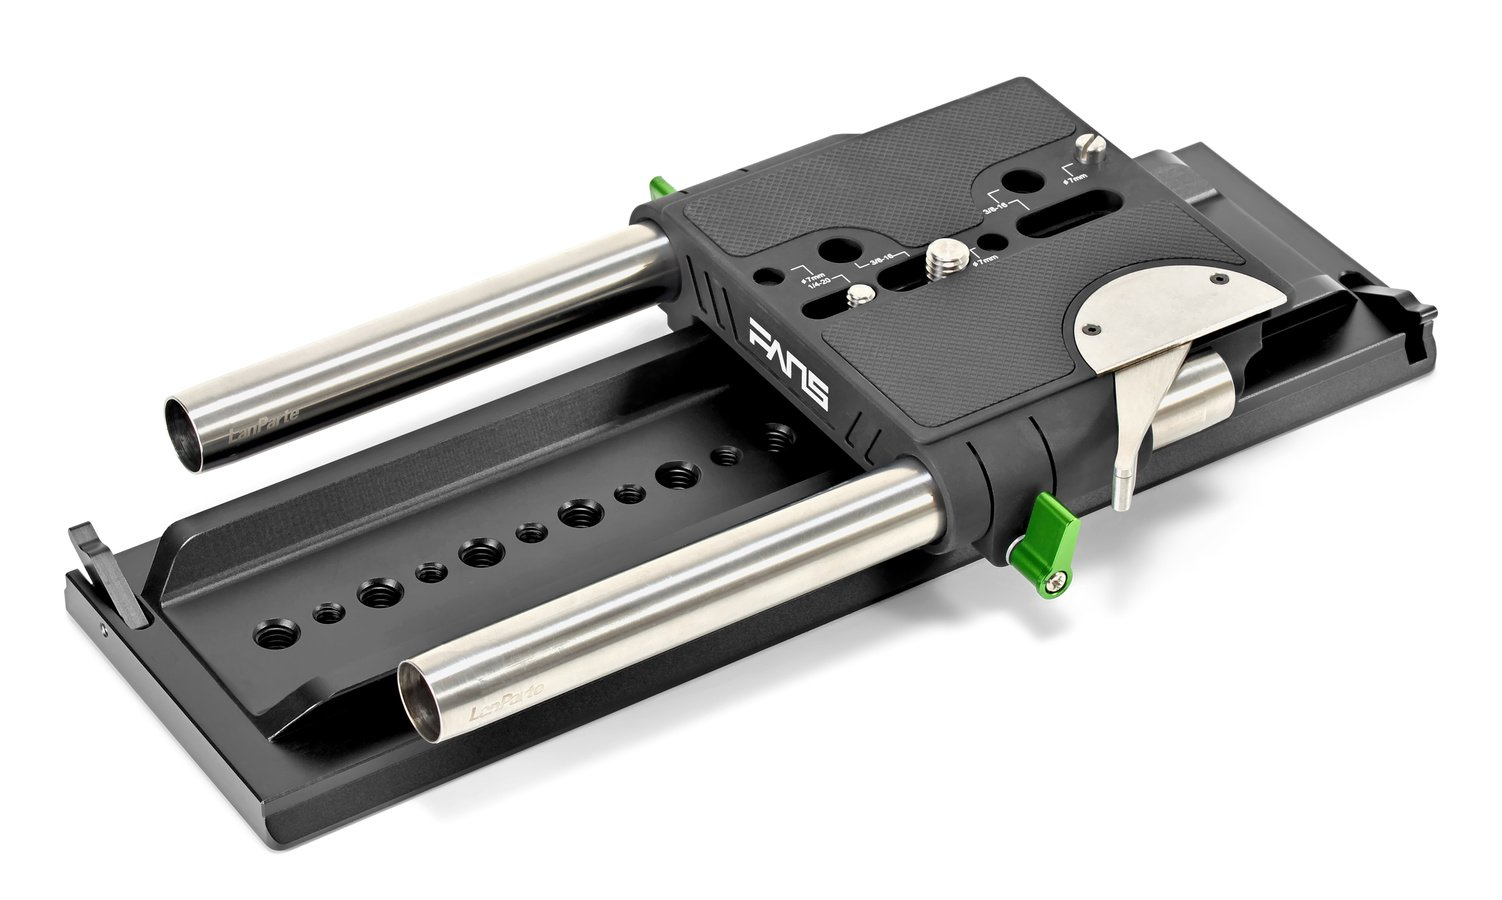 SmallRig 1463 Dovetail Stativplatte mit Lanparte BP19 19mm Baseplate.